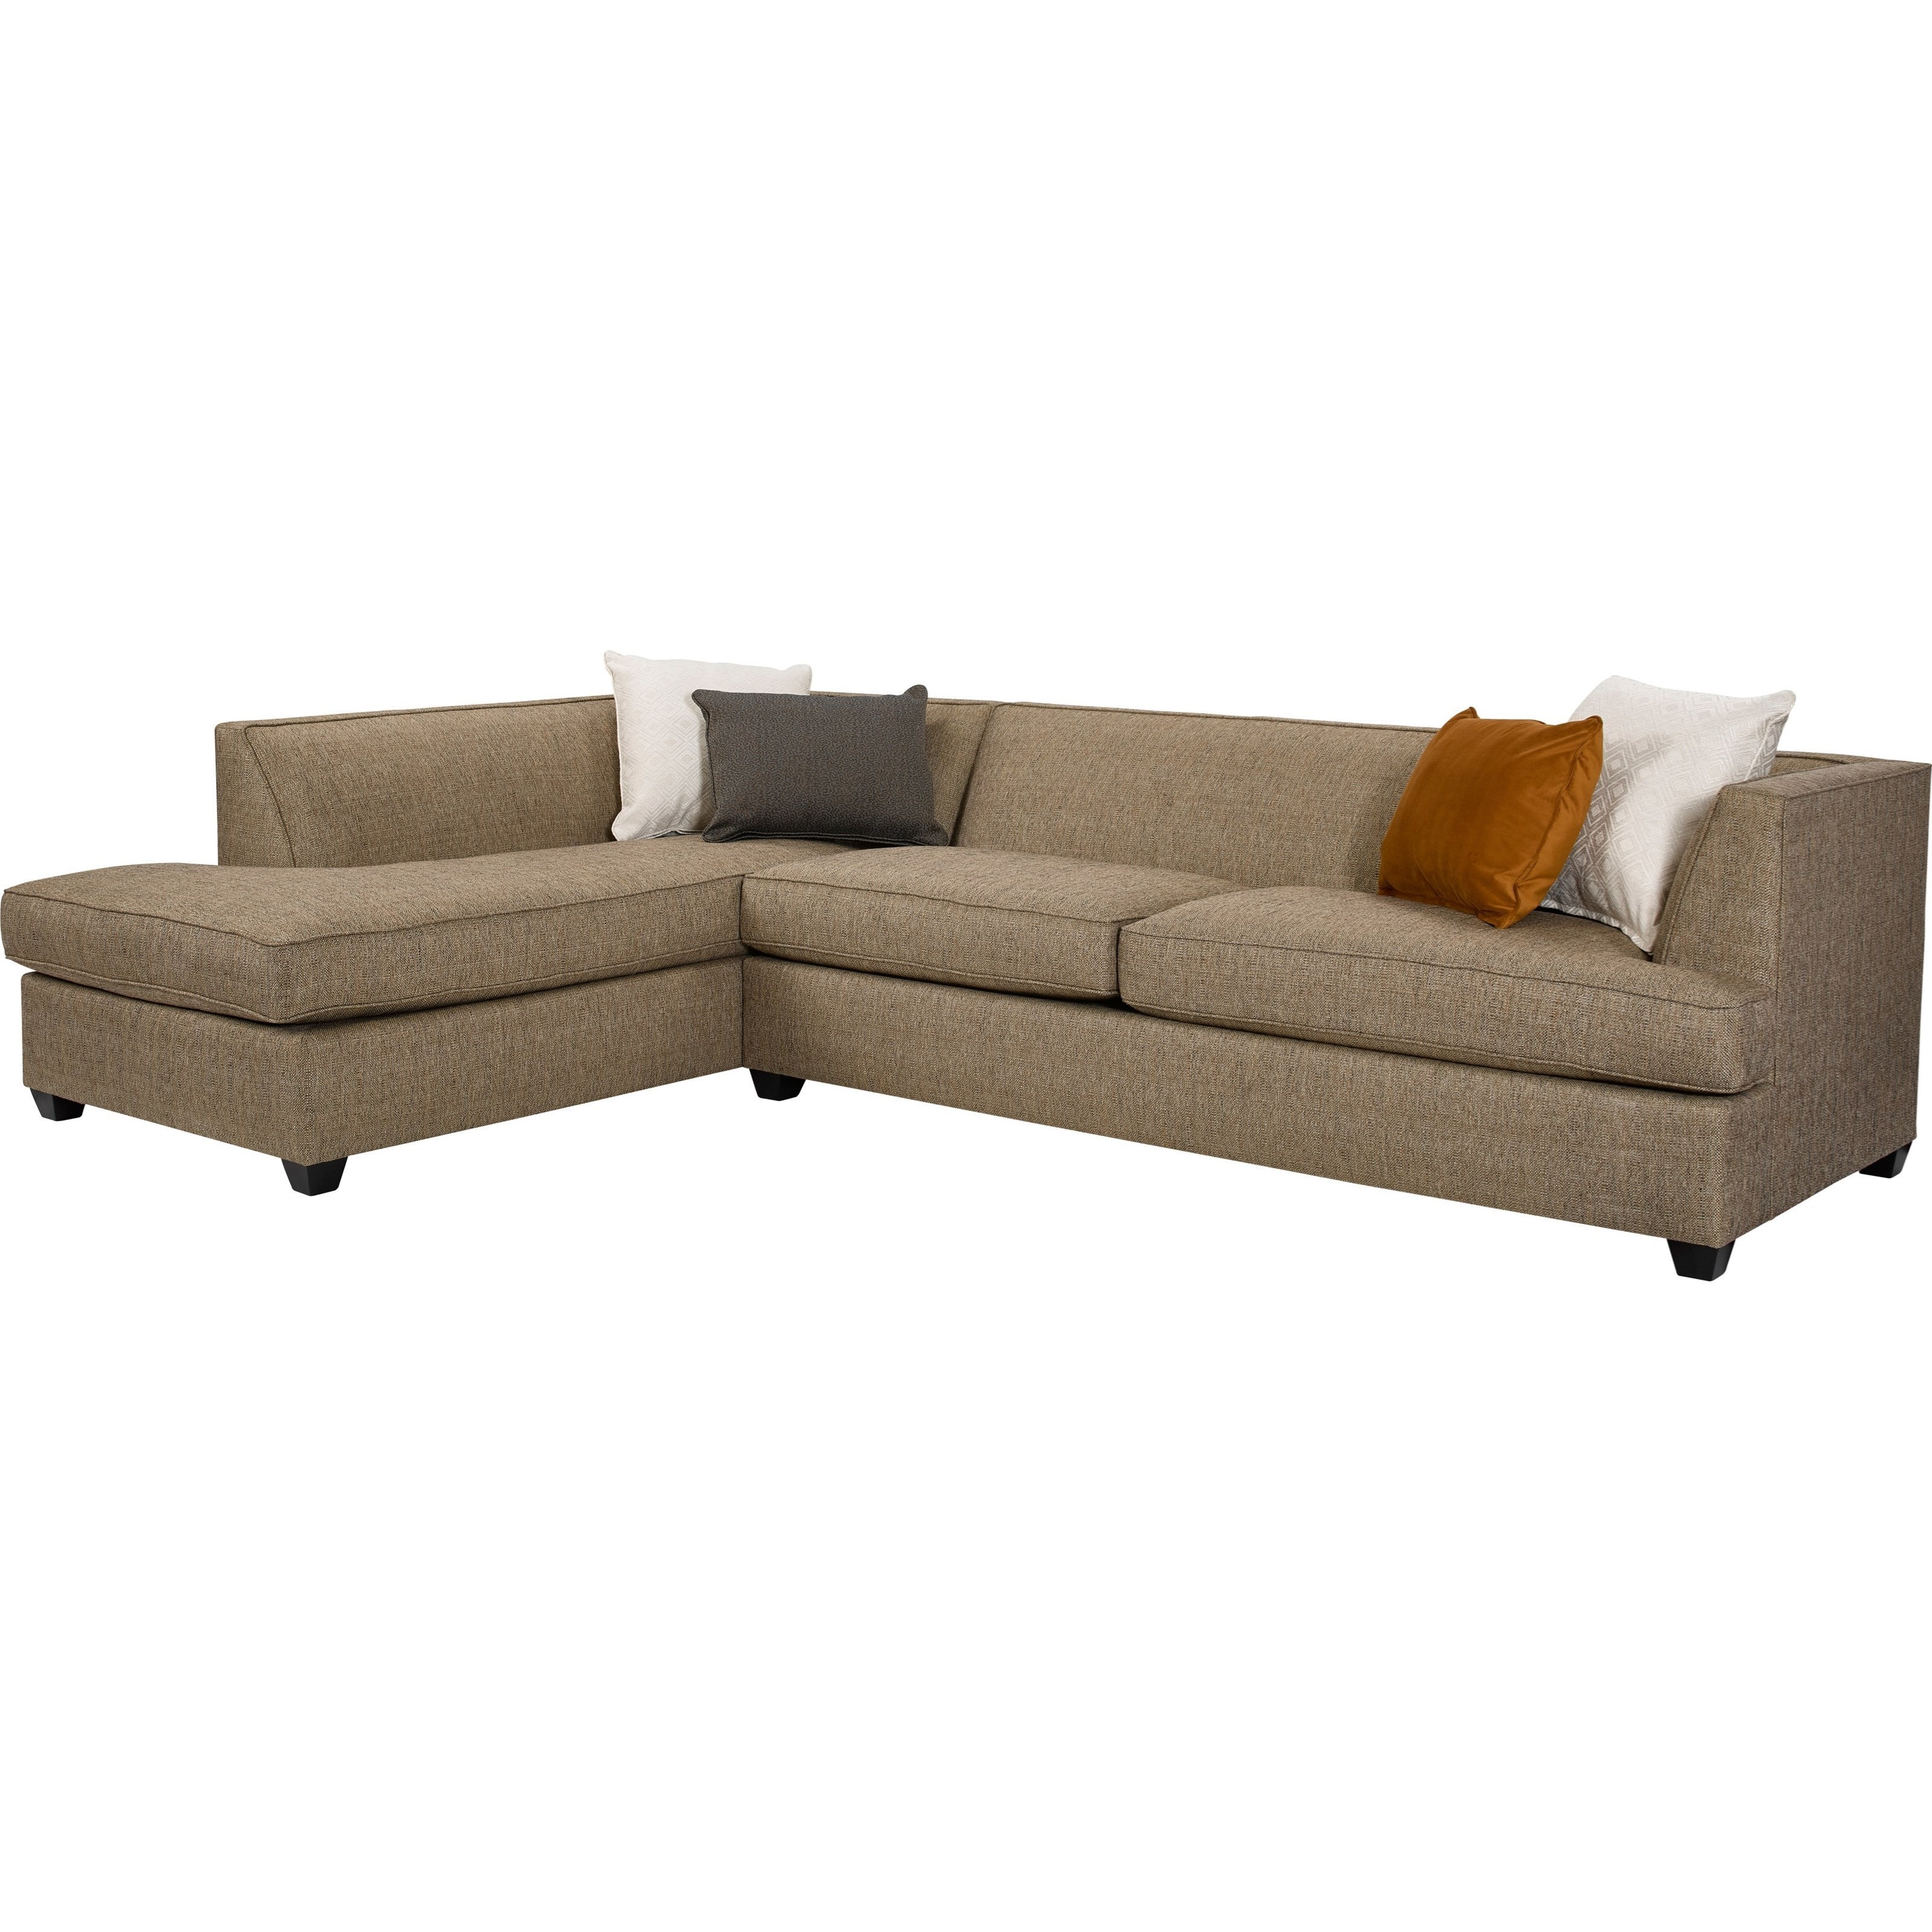 Broyhill Furniture Farida2 Piece Sectional Sofa ...